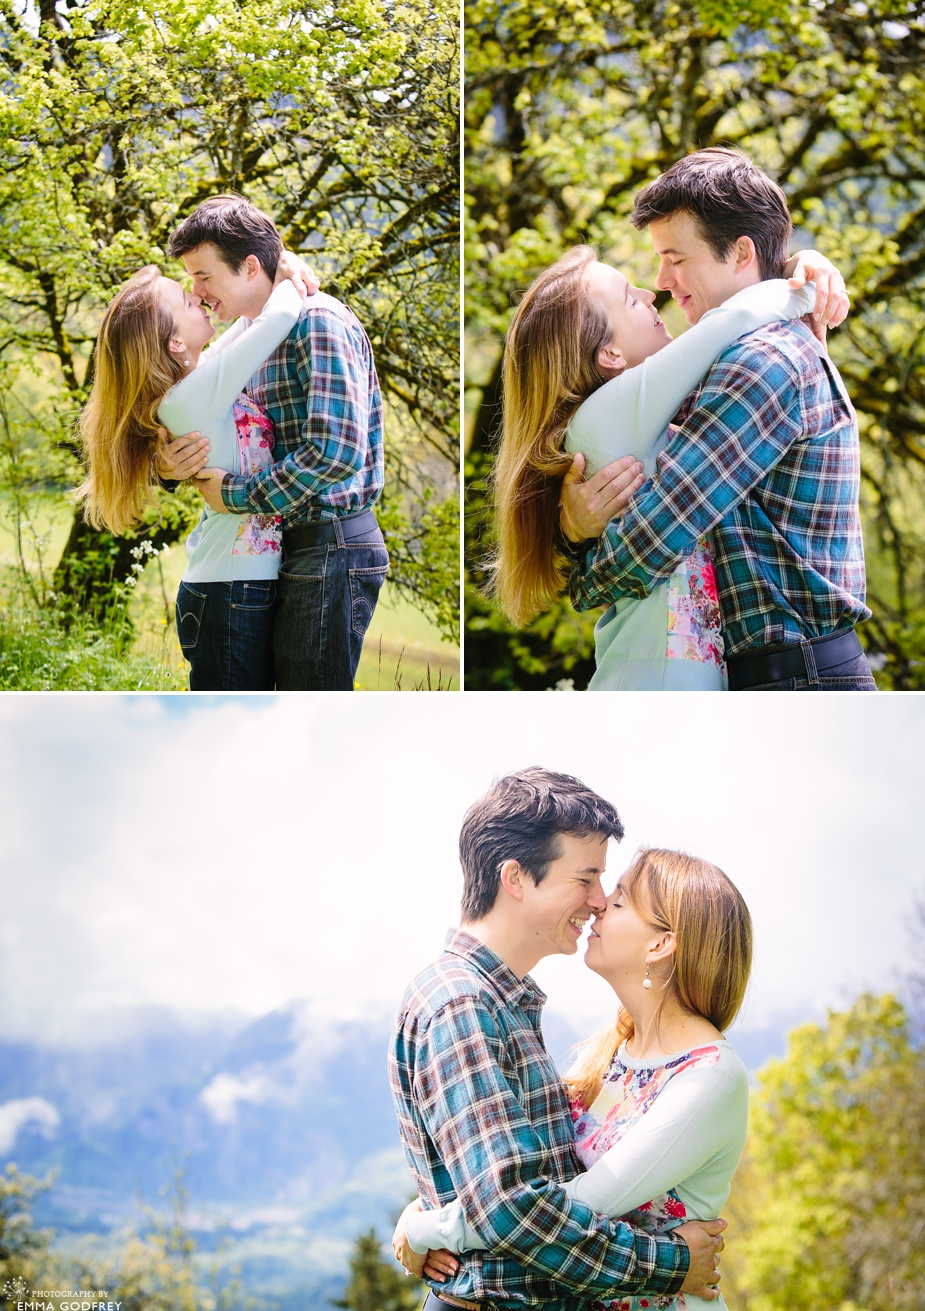 11-Corinne-Michael-Pre-wedding-0077-col.jpg